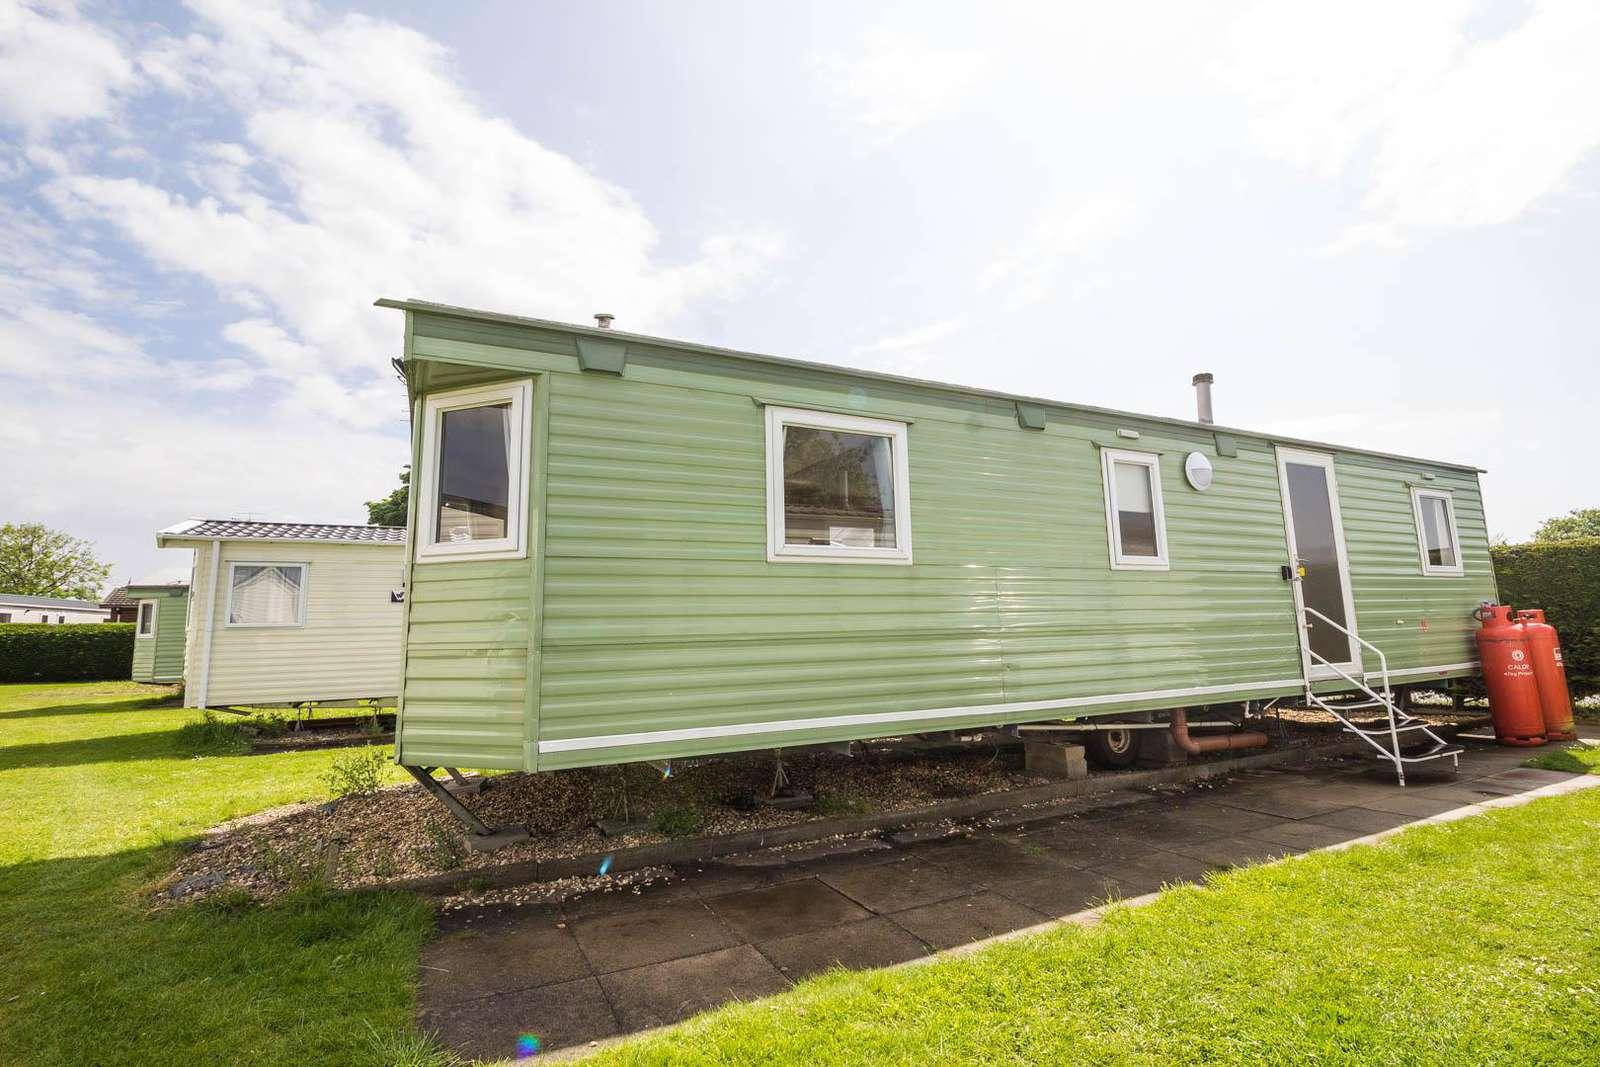 35120SD – Seal Drive area, 3 bed, 8 berth caravan. Emerald rated. - property